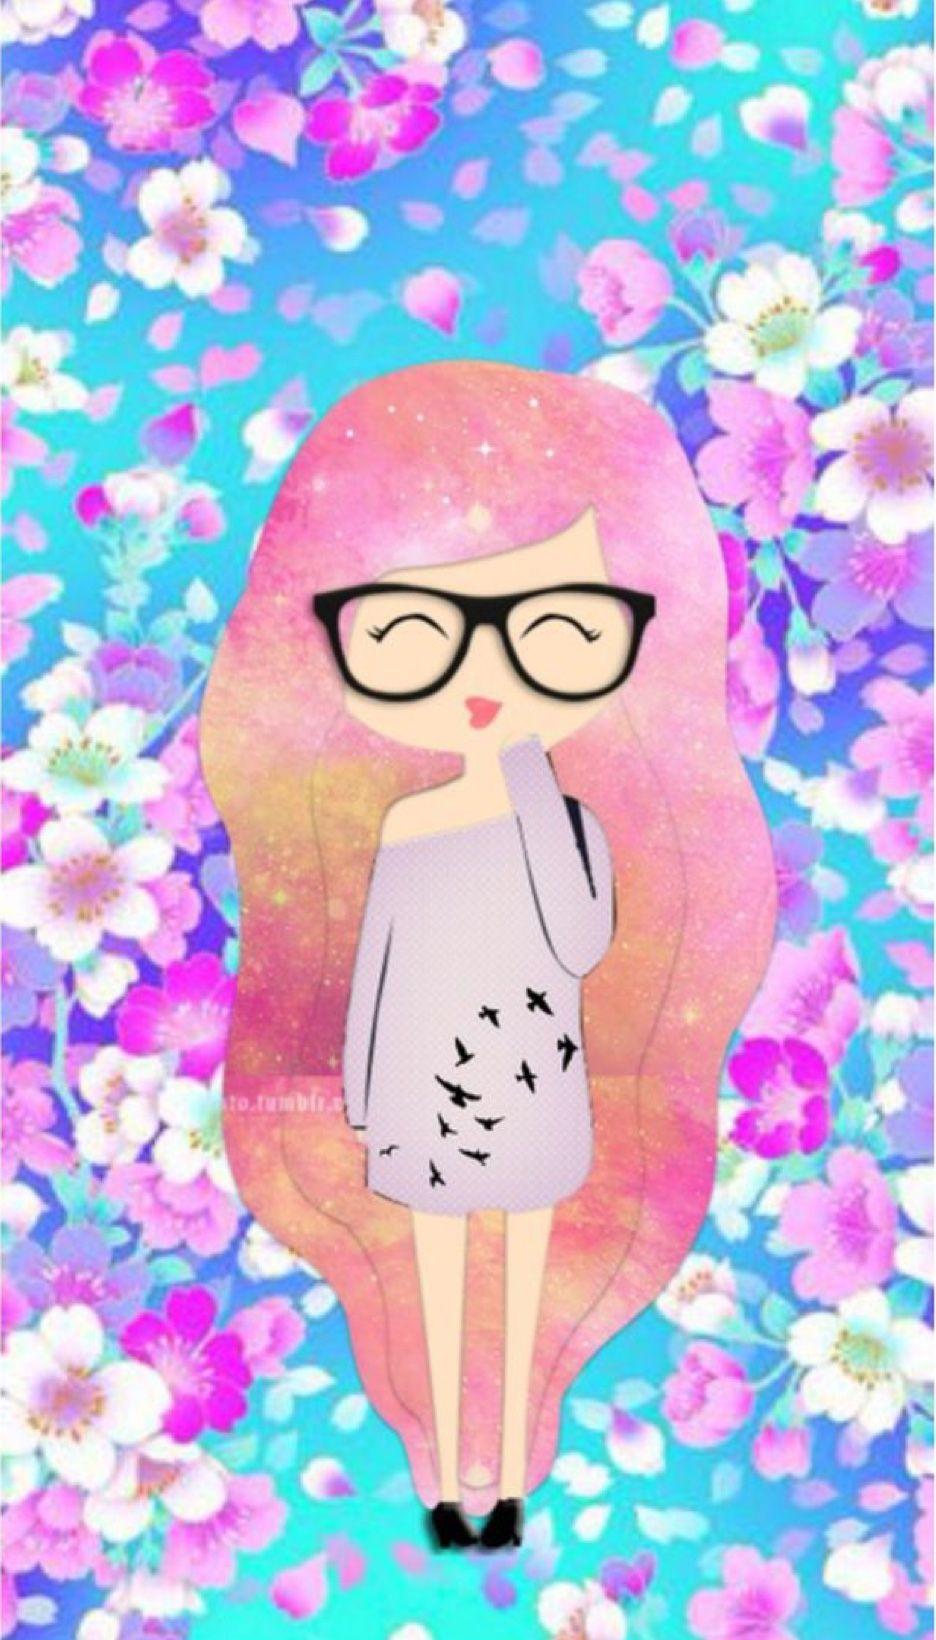 Pin By Layah Westbrook On Cute Wallpapers Cute Girl Wallpaper Cute Wallpapers Cute Drawings